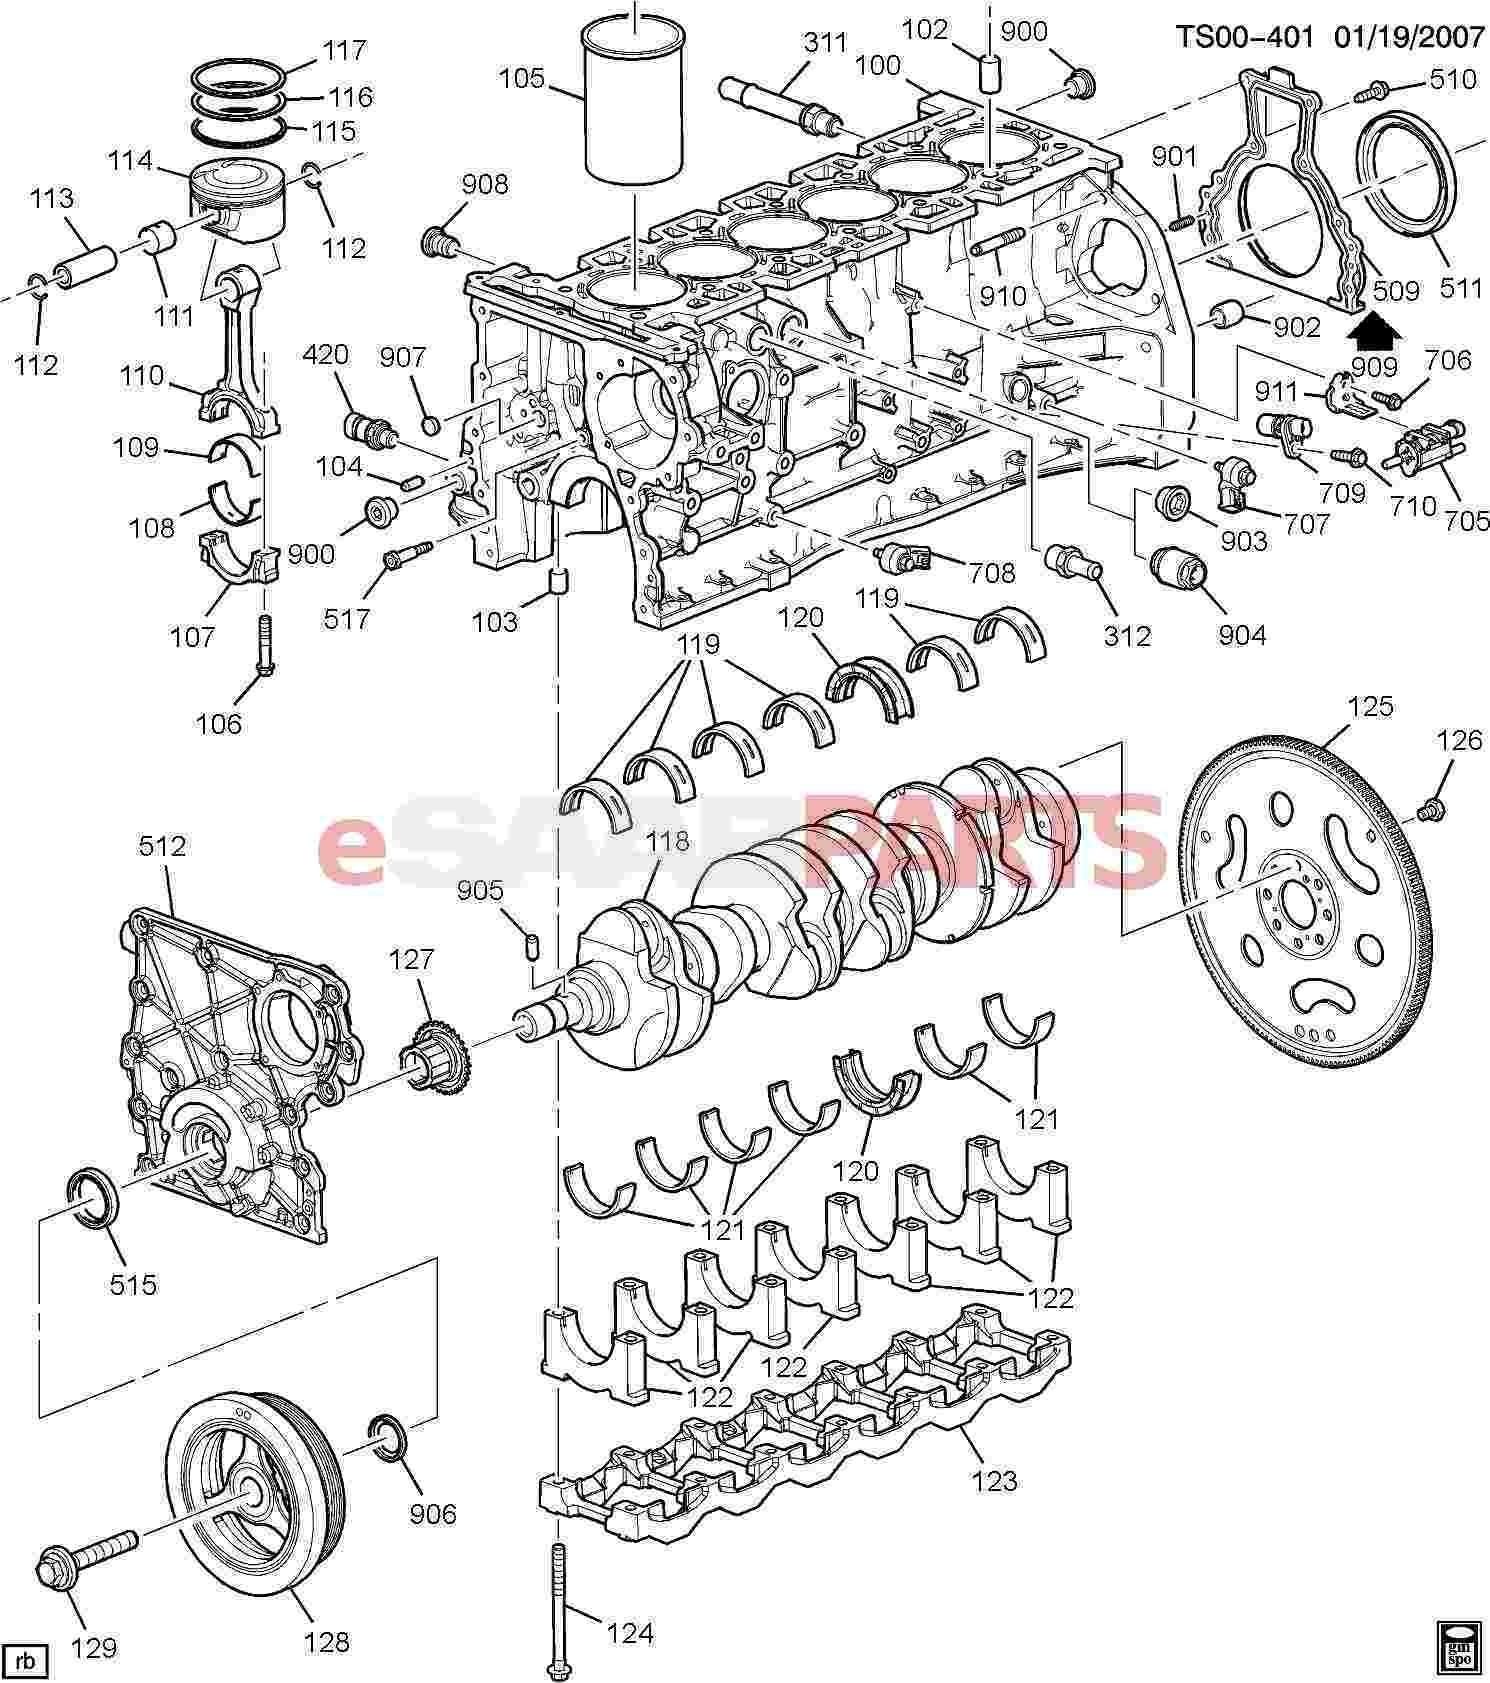 Car Undercarriage Parts Diagram Auto Parts Diagram Manual Info Wiring • Of Car Undercarriage Parts Diagram